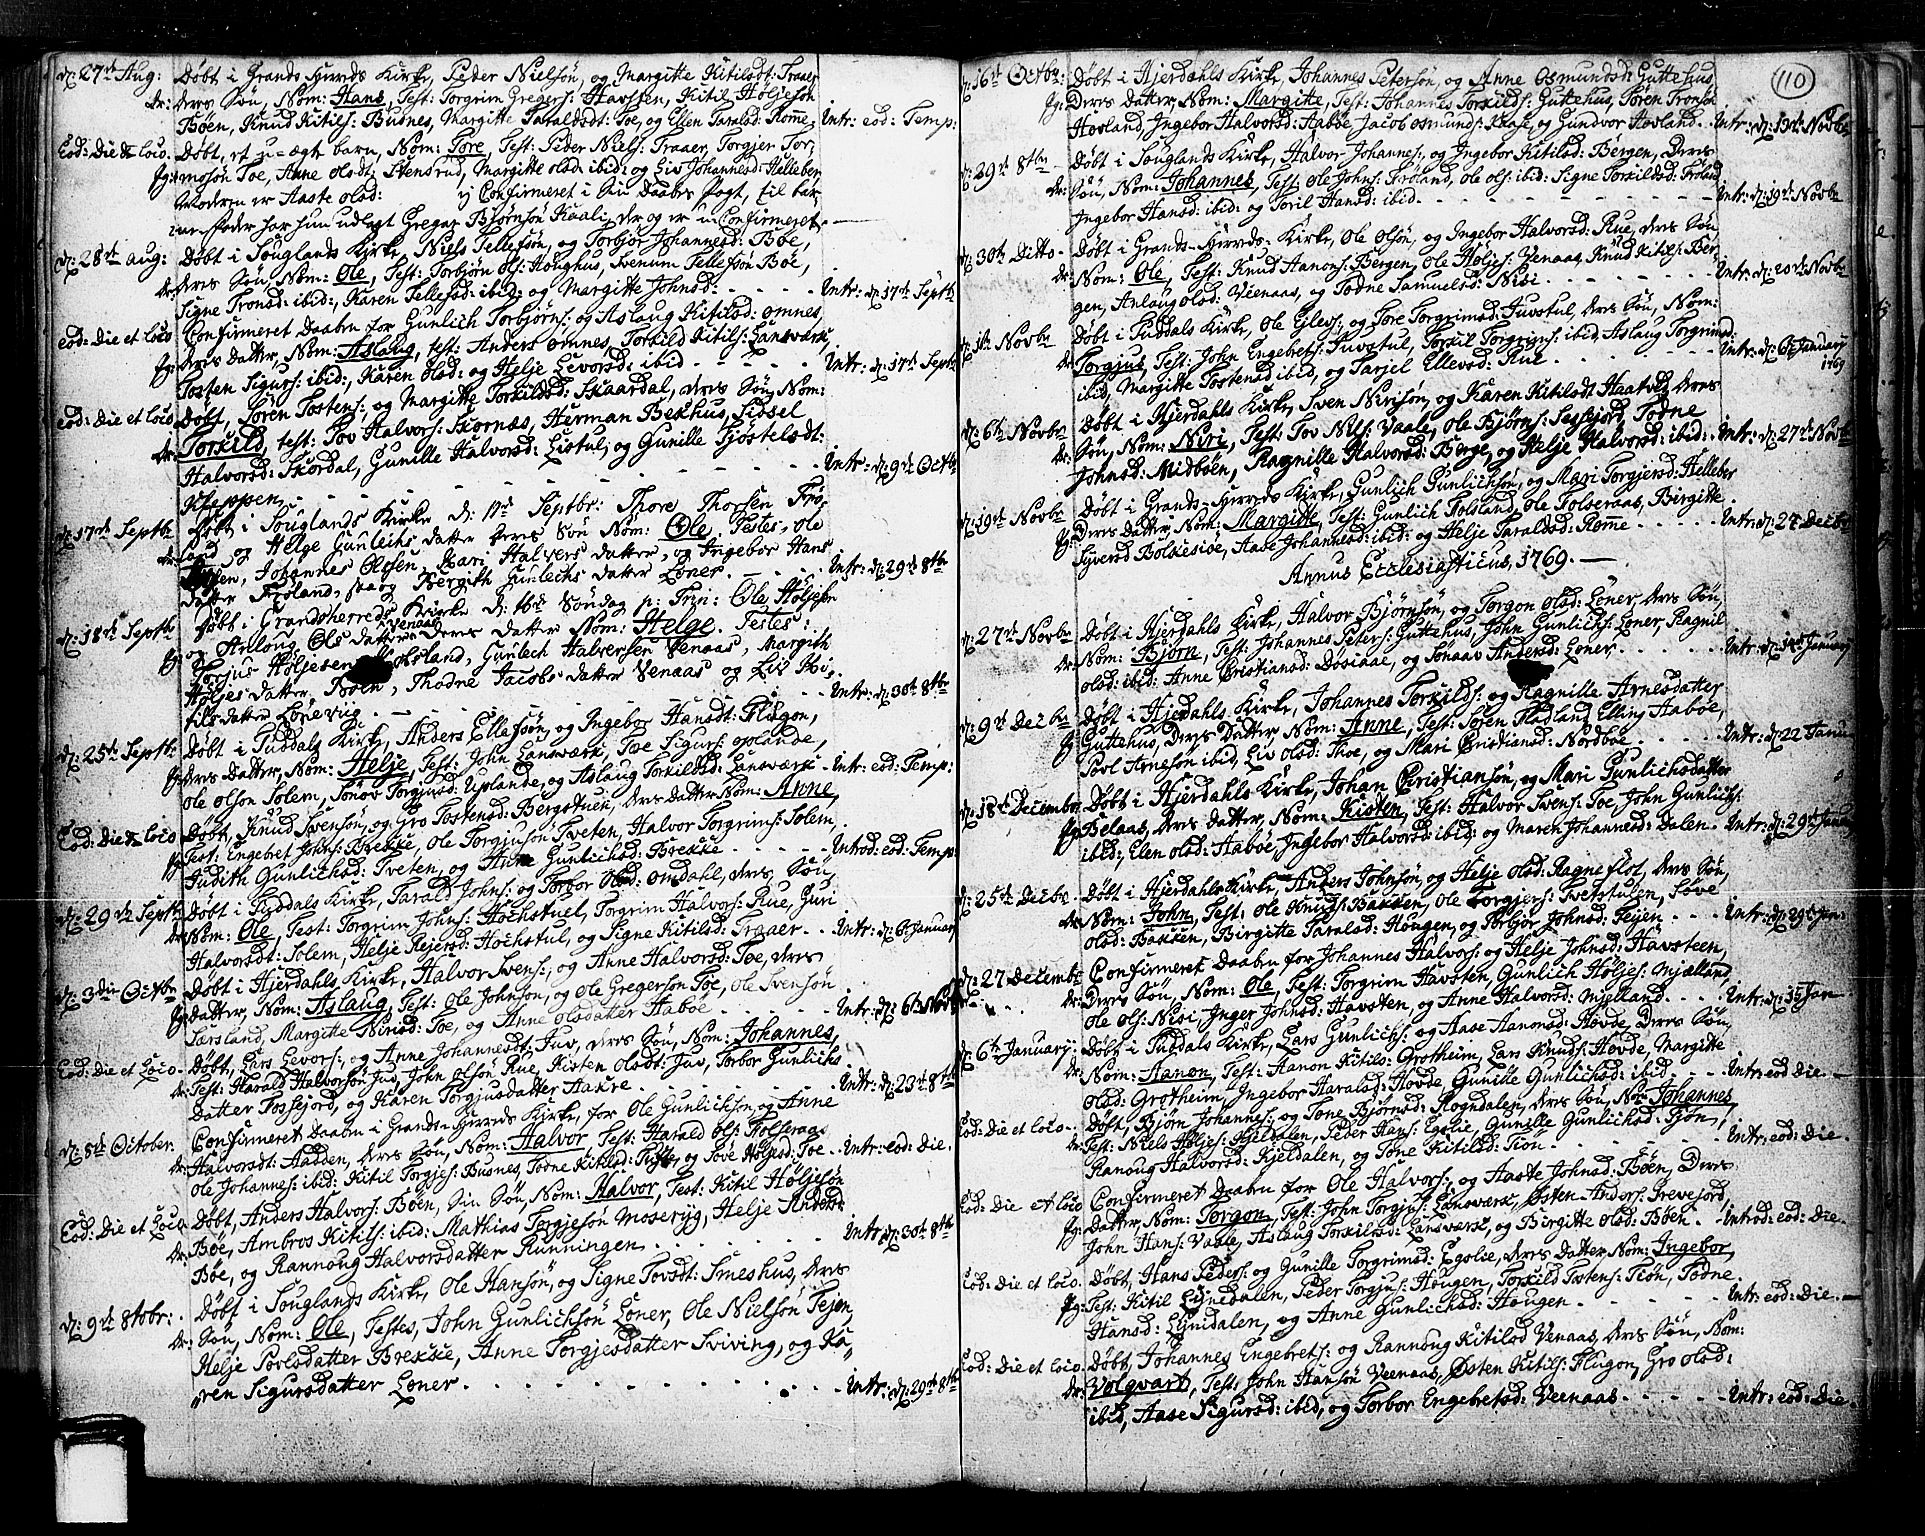 SAKO, Hjartdal kirkebøker, F/Fa/L0003: Ministerialbok nr. I 3, 1727-1775, s. 110